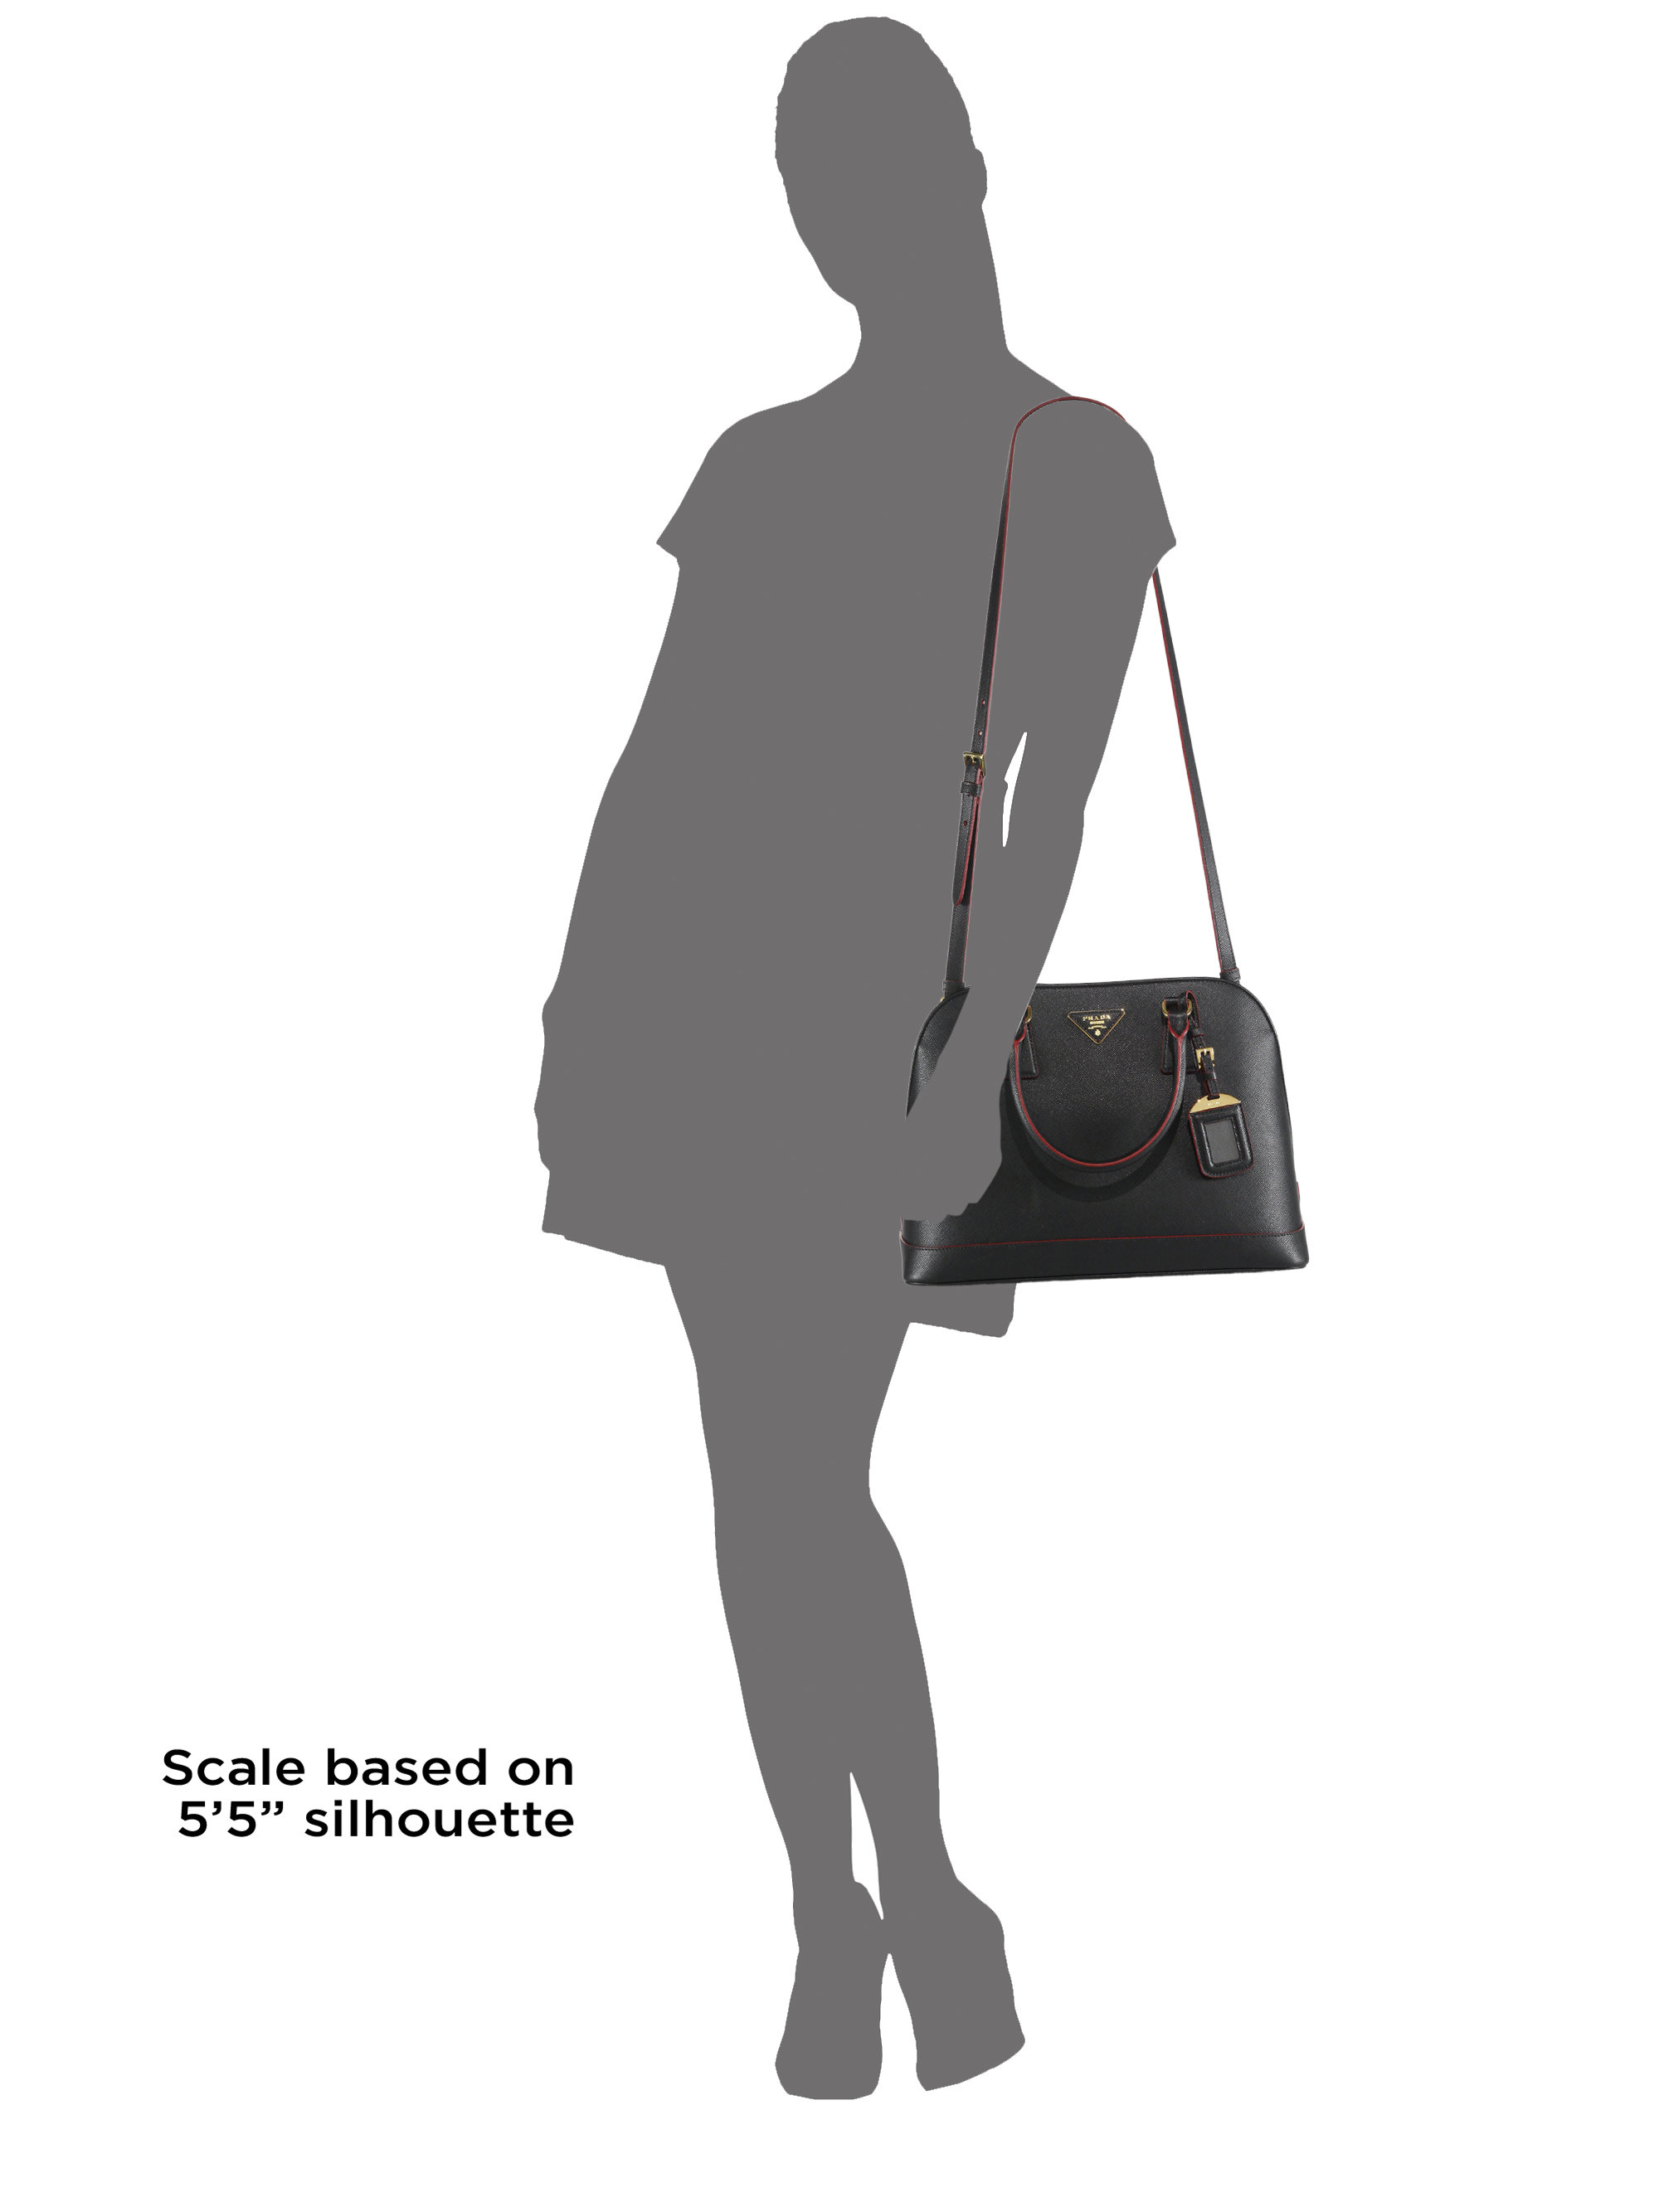 aaaa replica handbags - Prada Saffiano Lux Promenade Leather Satchel in Black | Lyst